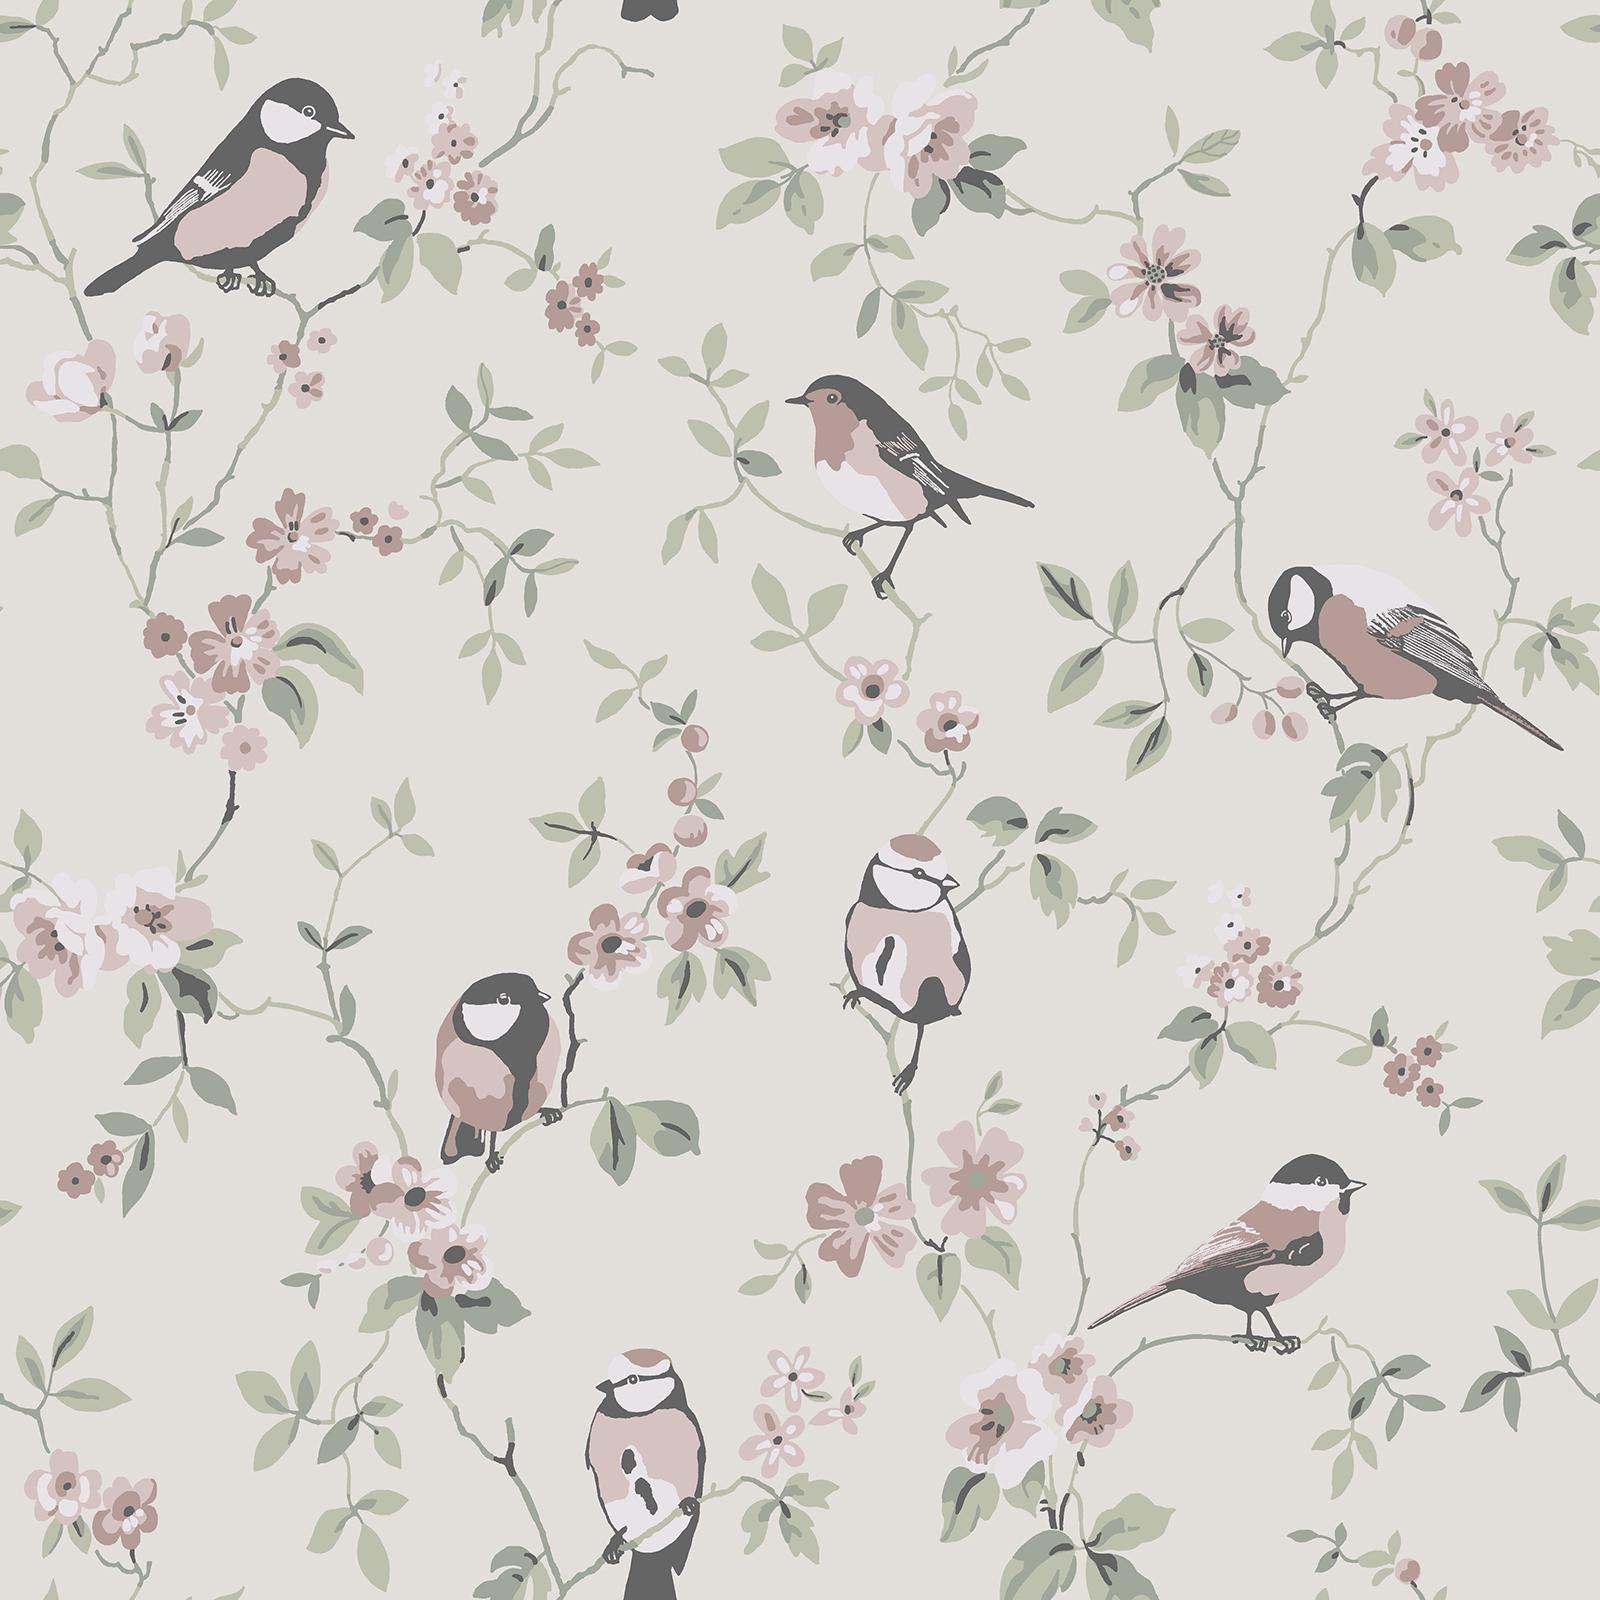 Bor¥stapeter Wallpaper Falsterbo II Falsterbo Birds 4024 4024